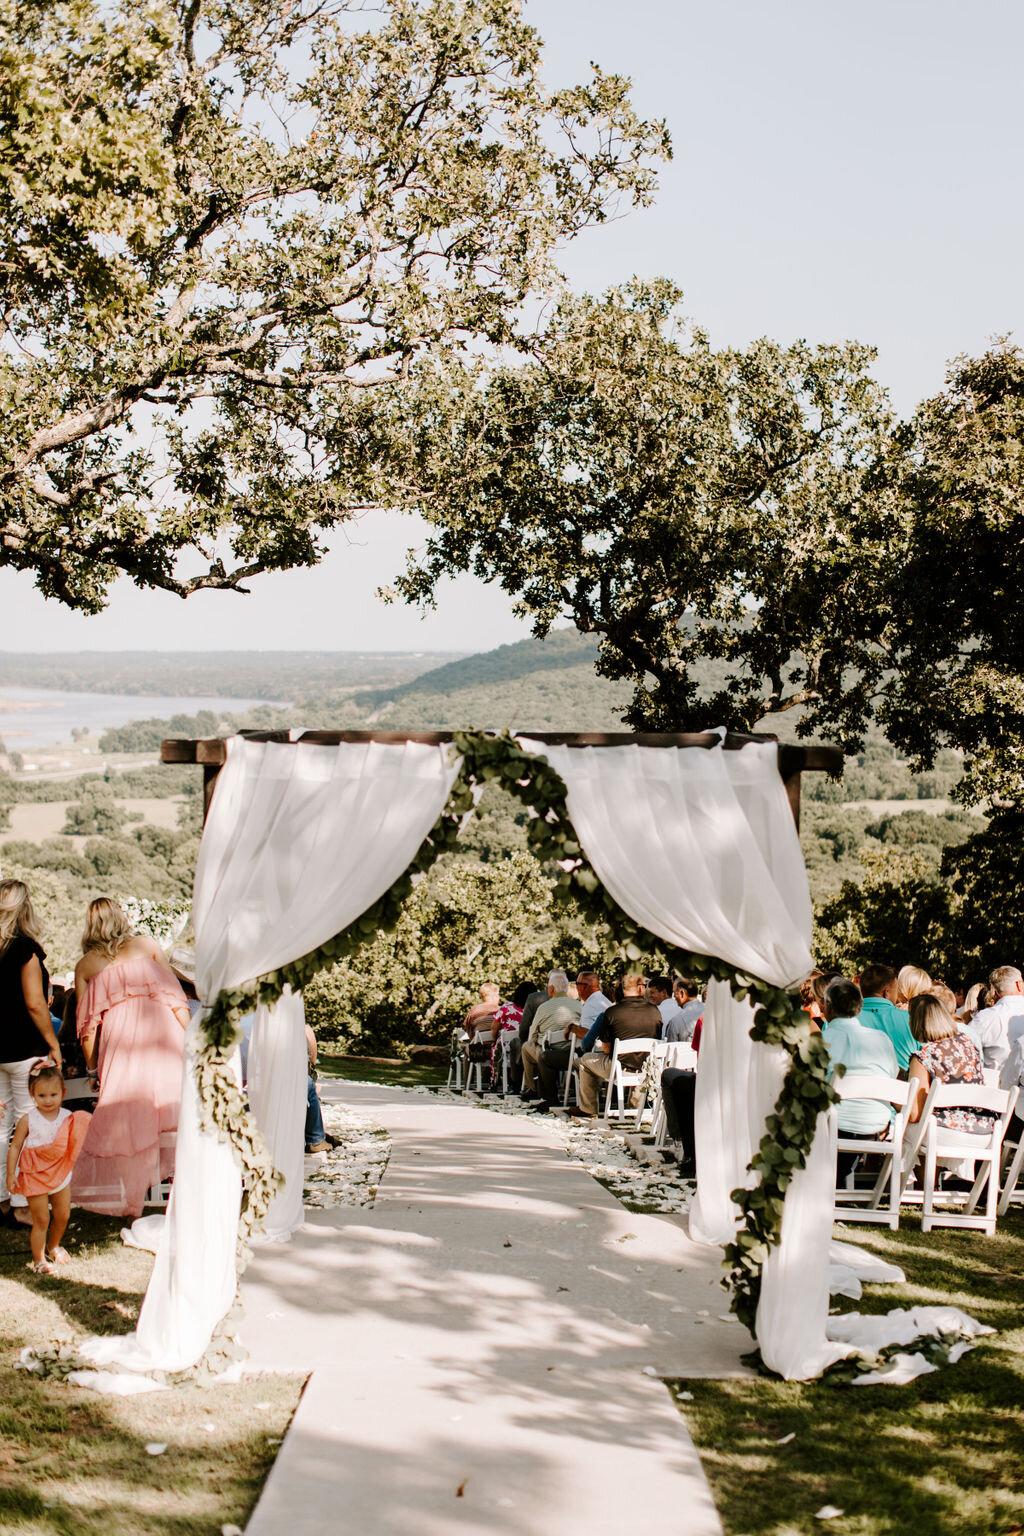 Tulsa White Barn Wedding Venue Outdoor Ceremony 18.JPG